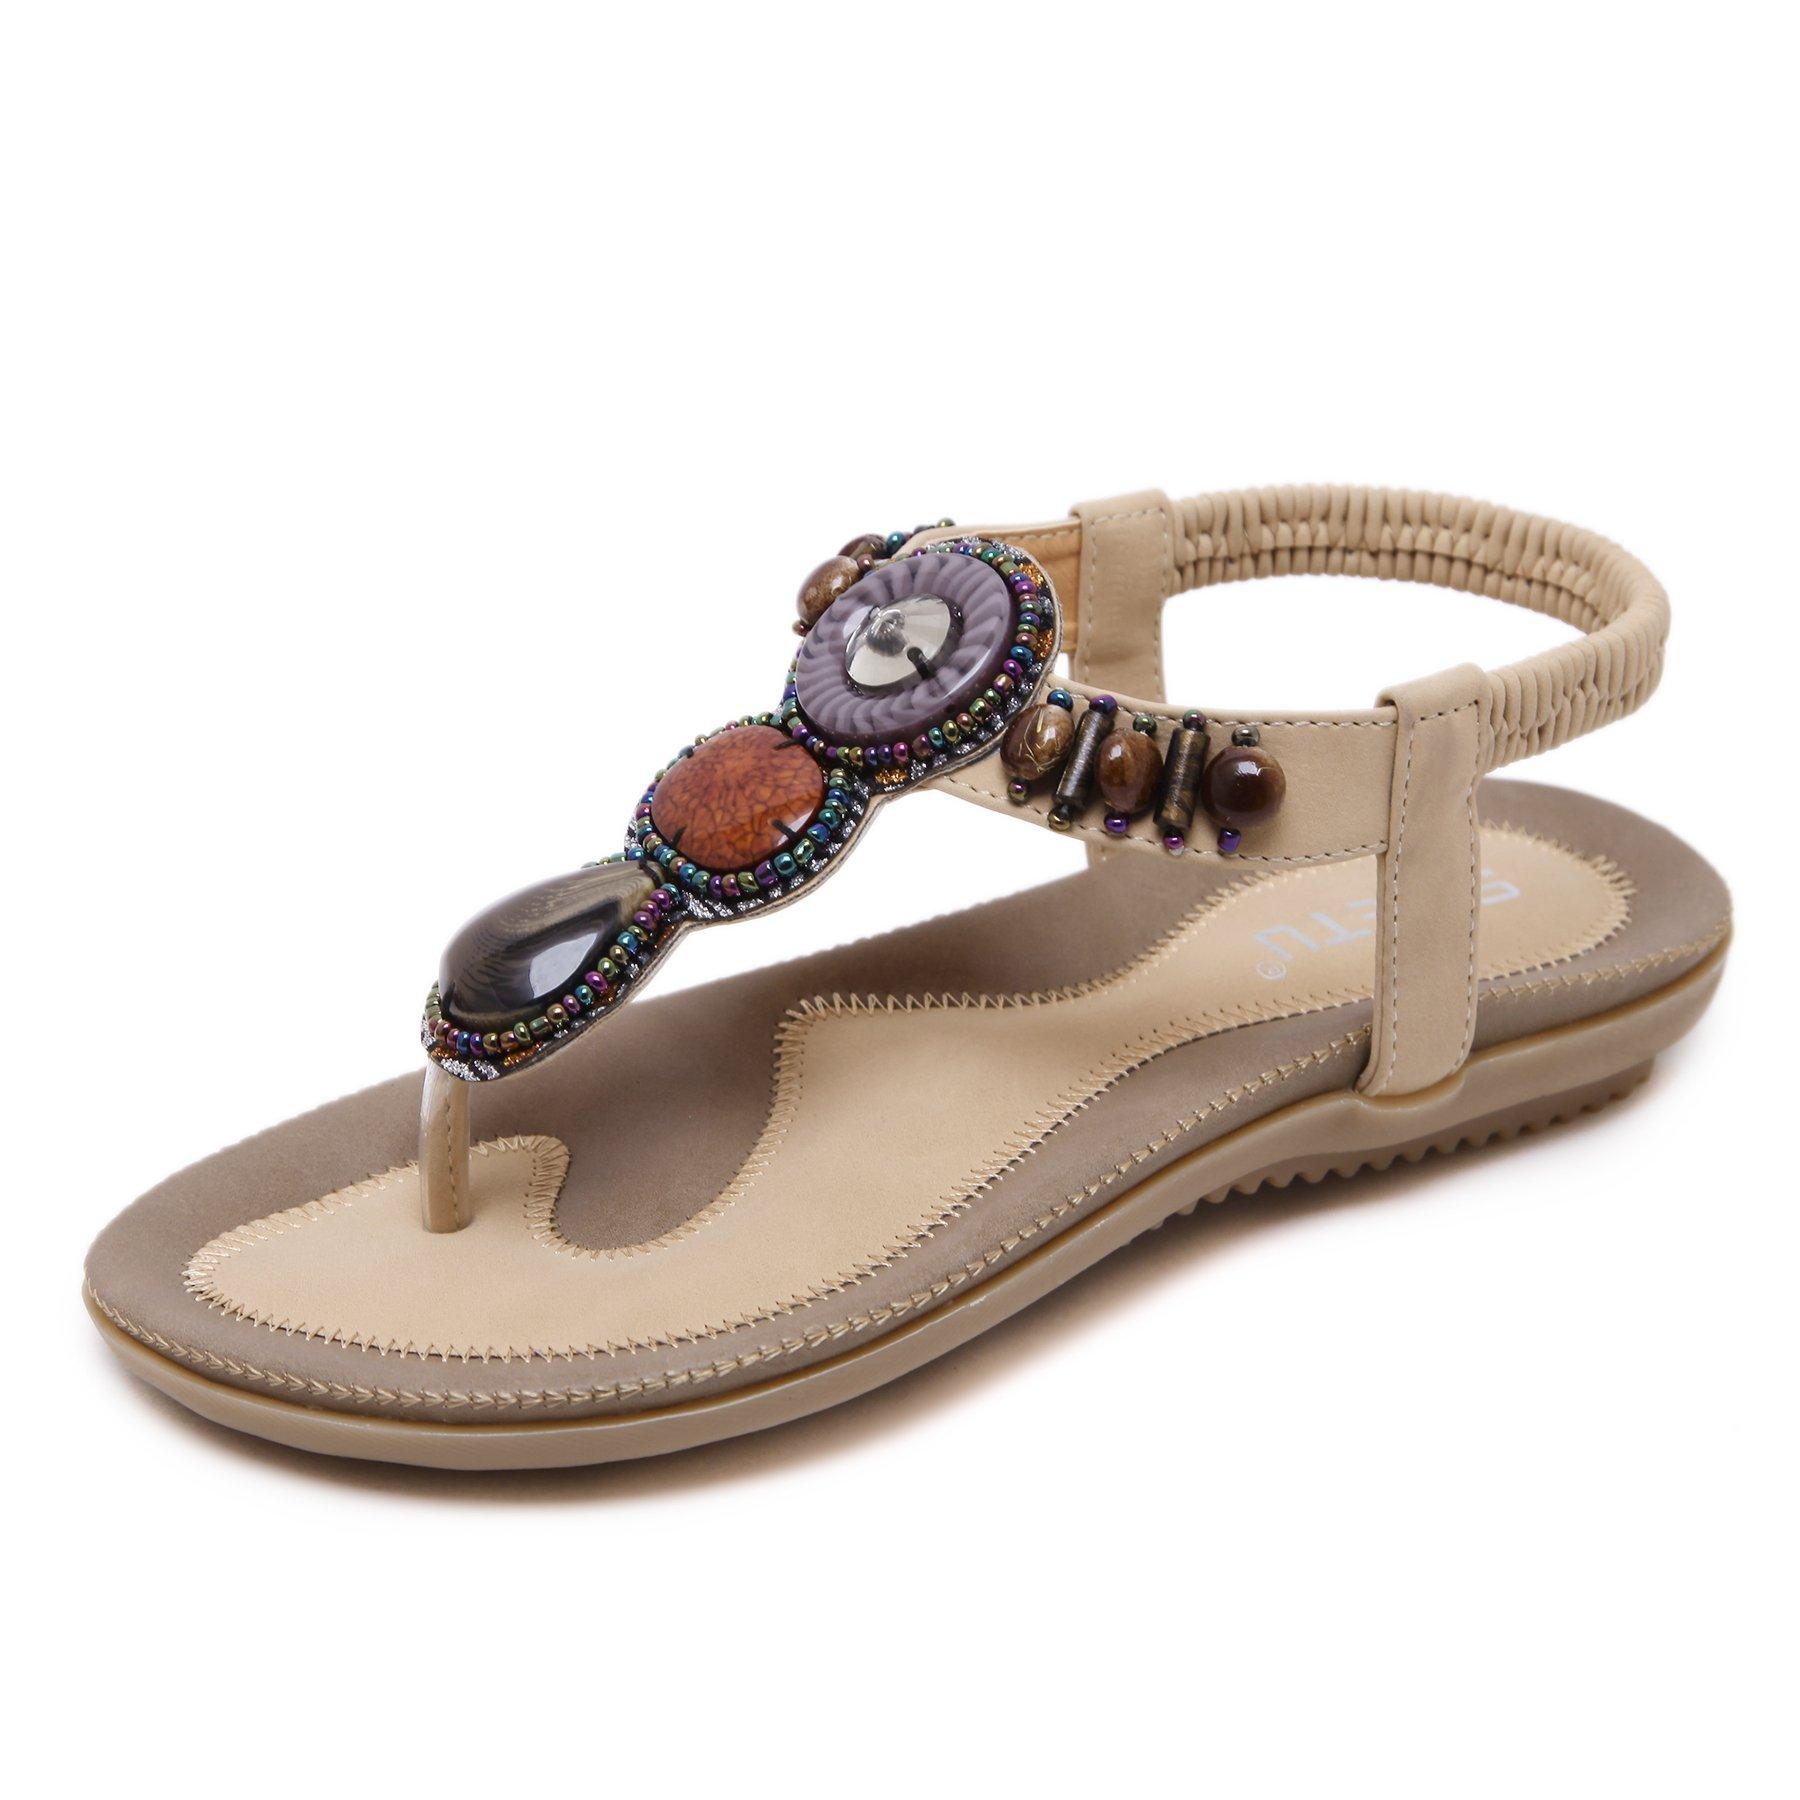 Orangetime Sandals Women Slingback T-Strap Flat Sandal Comfort Bohemian Beach Flats Ladies Ankle Strap Thong Sandals Apricot 37